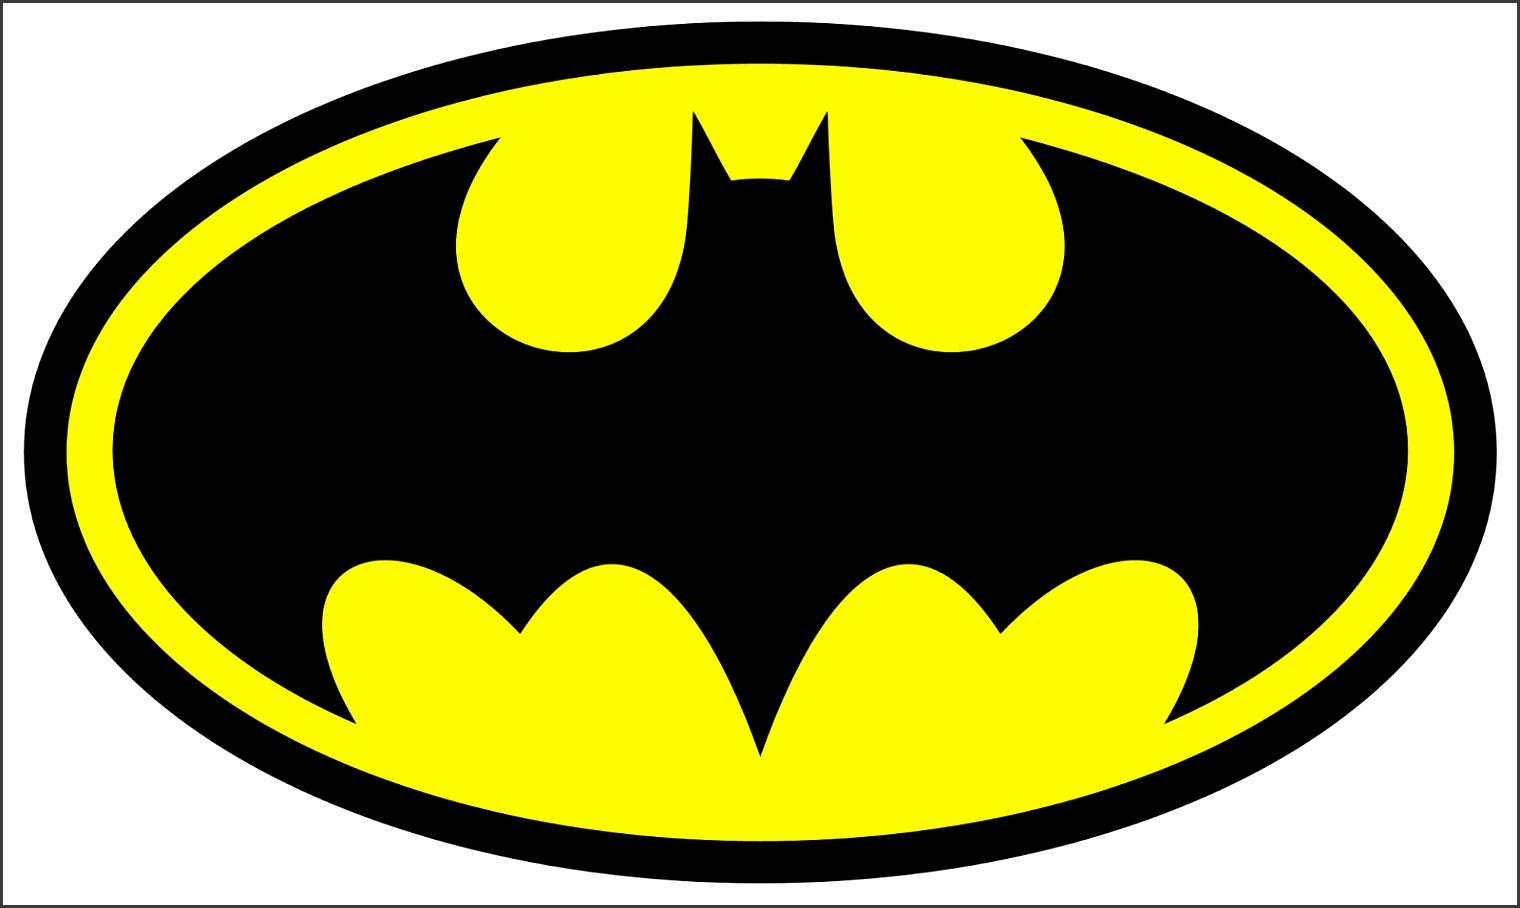 Batman Mask Template Printable logo clipart best printable